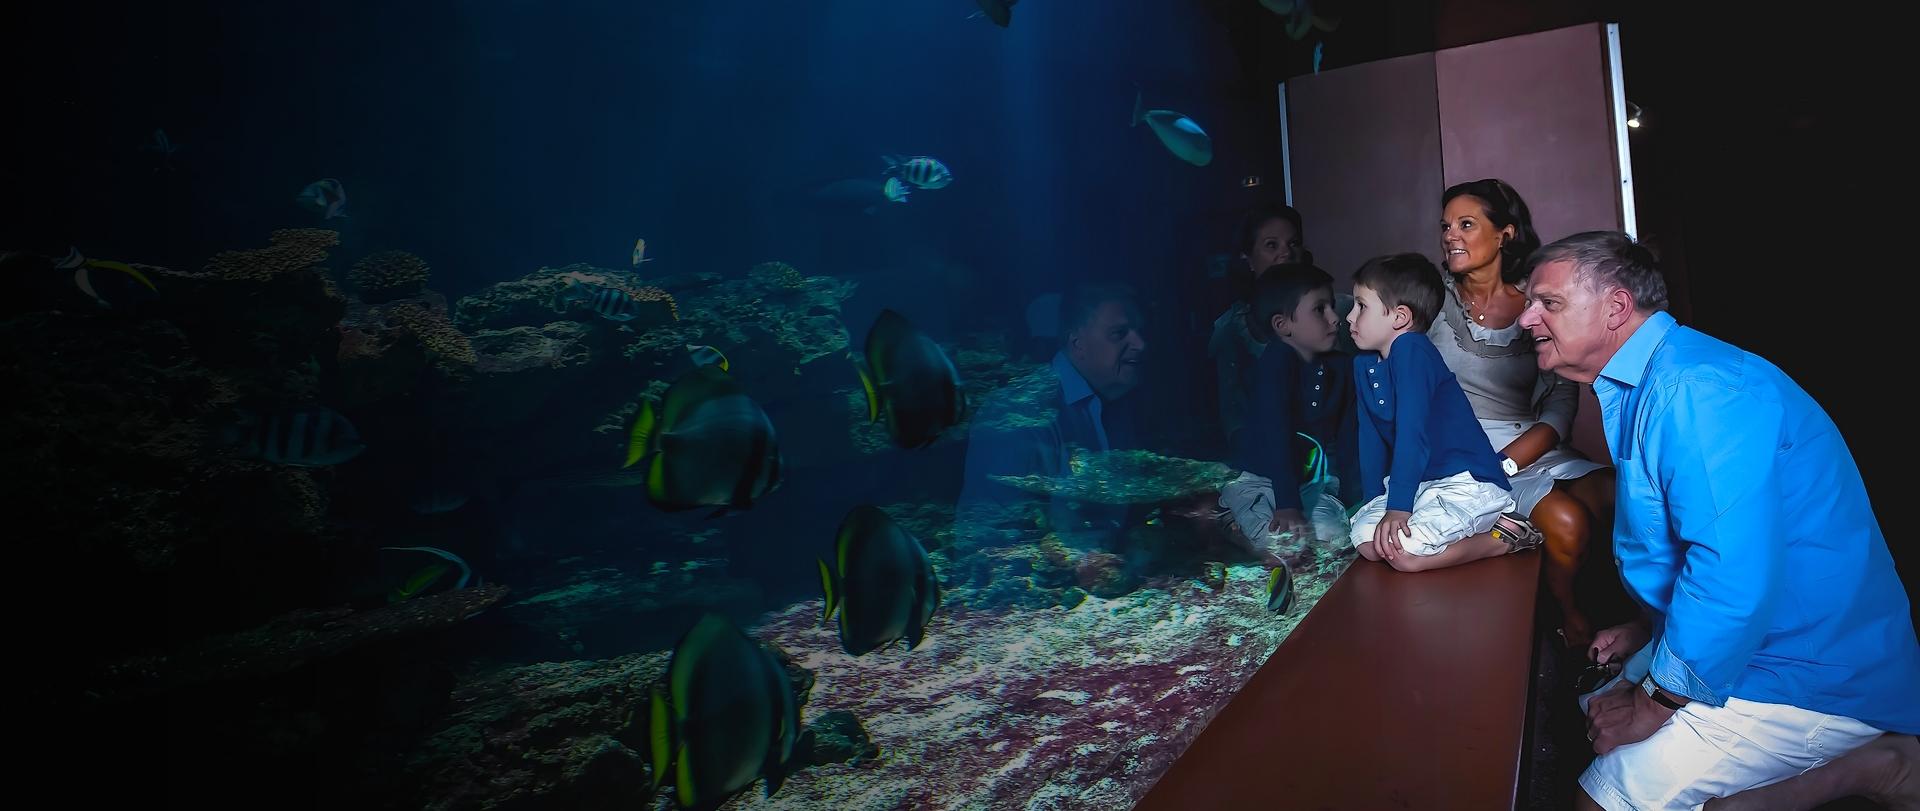 cité aquarium deau de mer